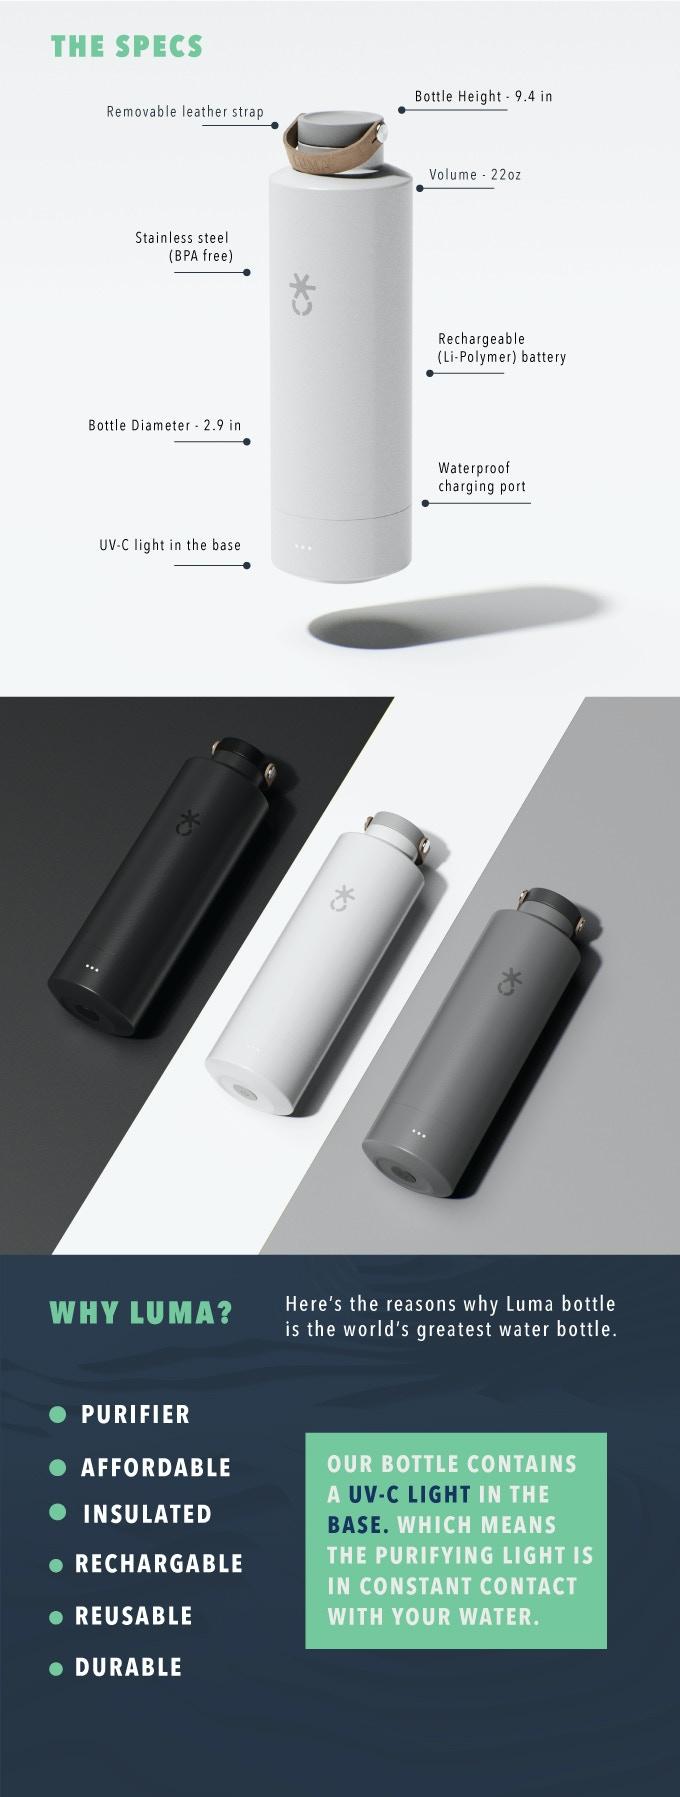 The Luma Bottle | A Self-Cleaning Reusable Water Bottle by Luma